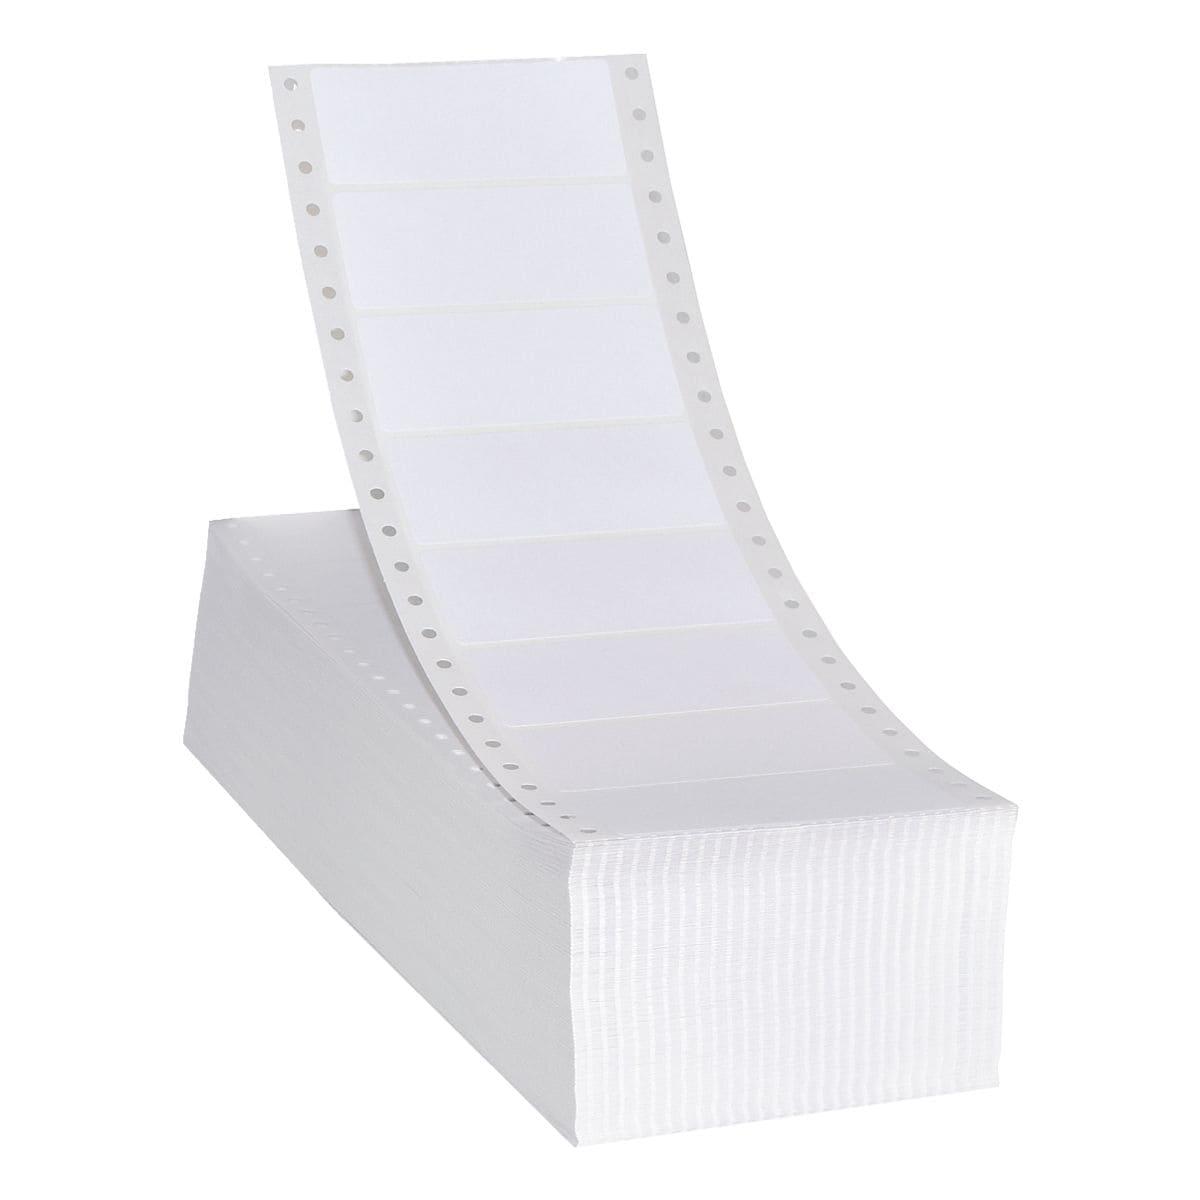 OTTO Office 4000er-Pack Endlosetiketten (88.9 mm breit)